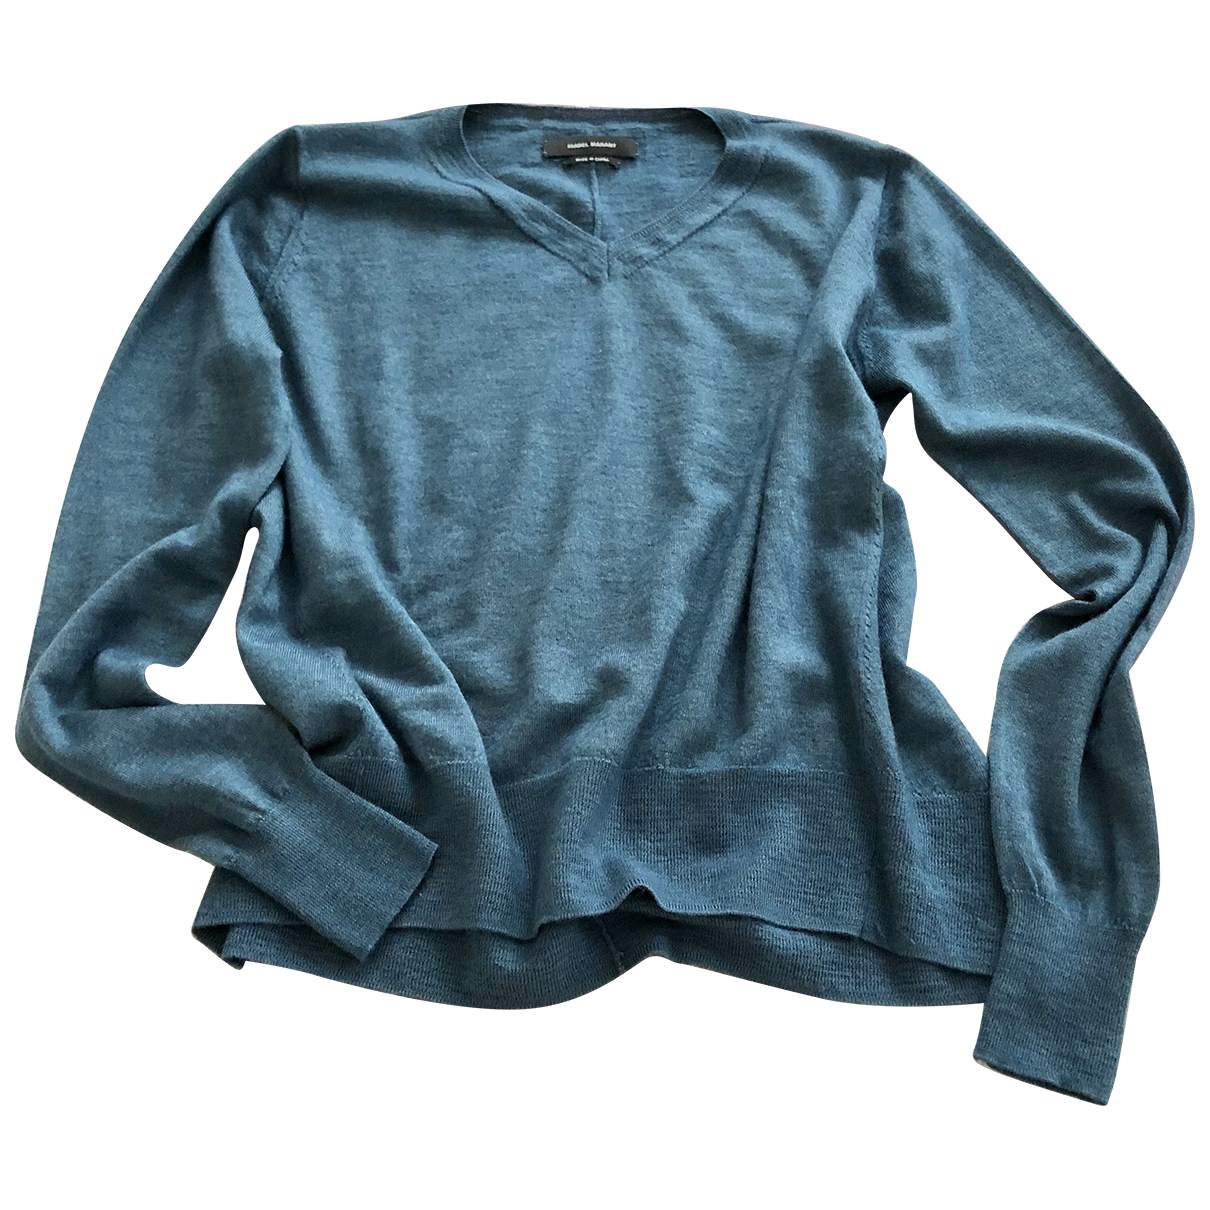 Isabel Marant N Blue Cashmere Knitwear for Women 36 FR